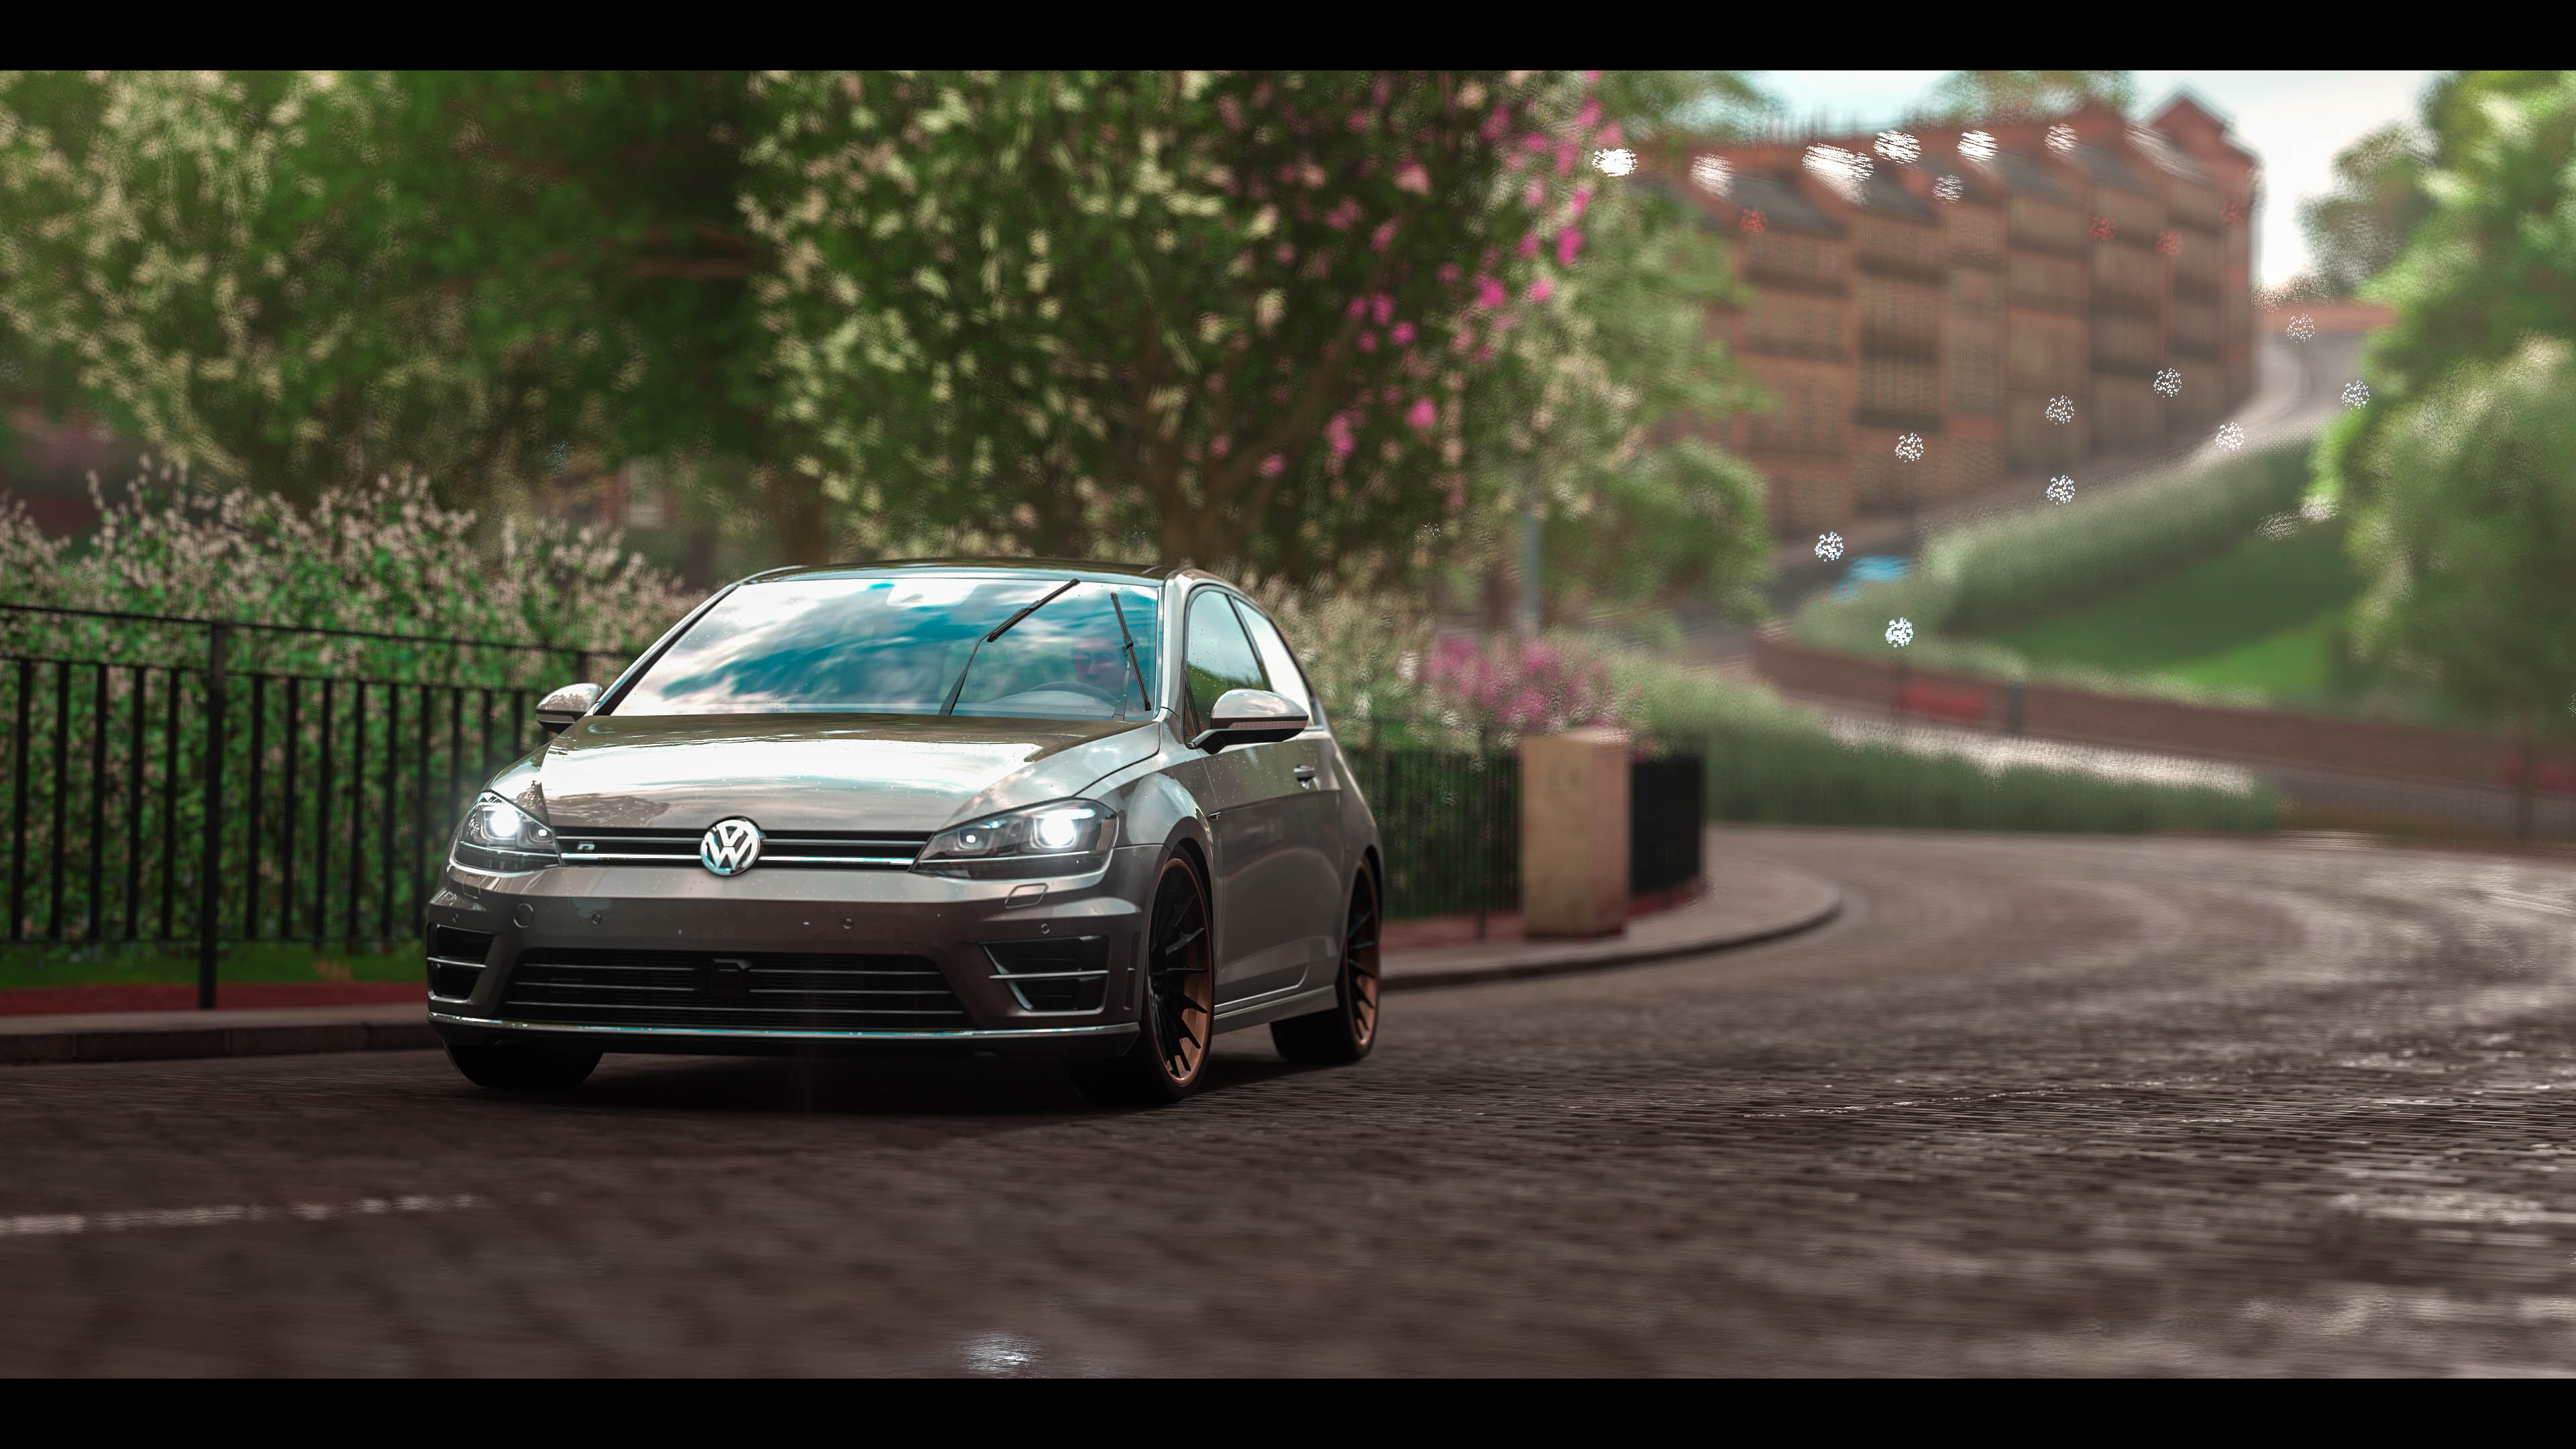 45934349162_f4c8500fec_o ForzaMotorsport.fr